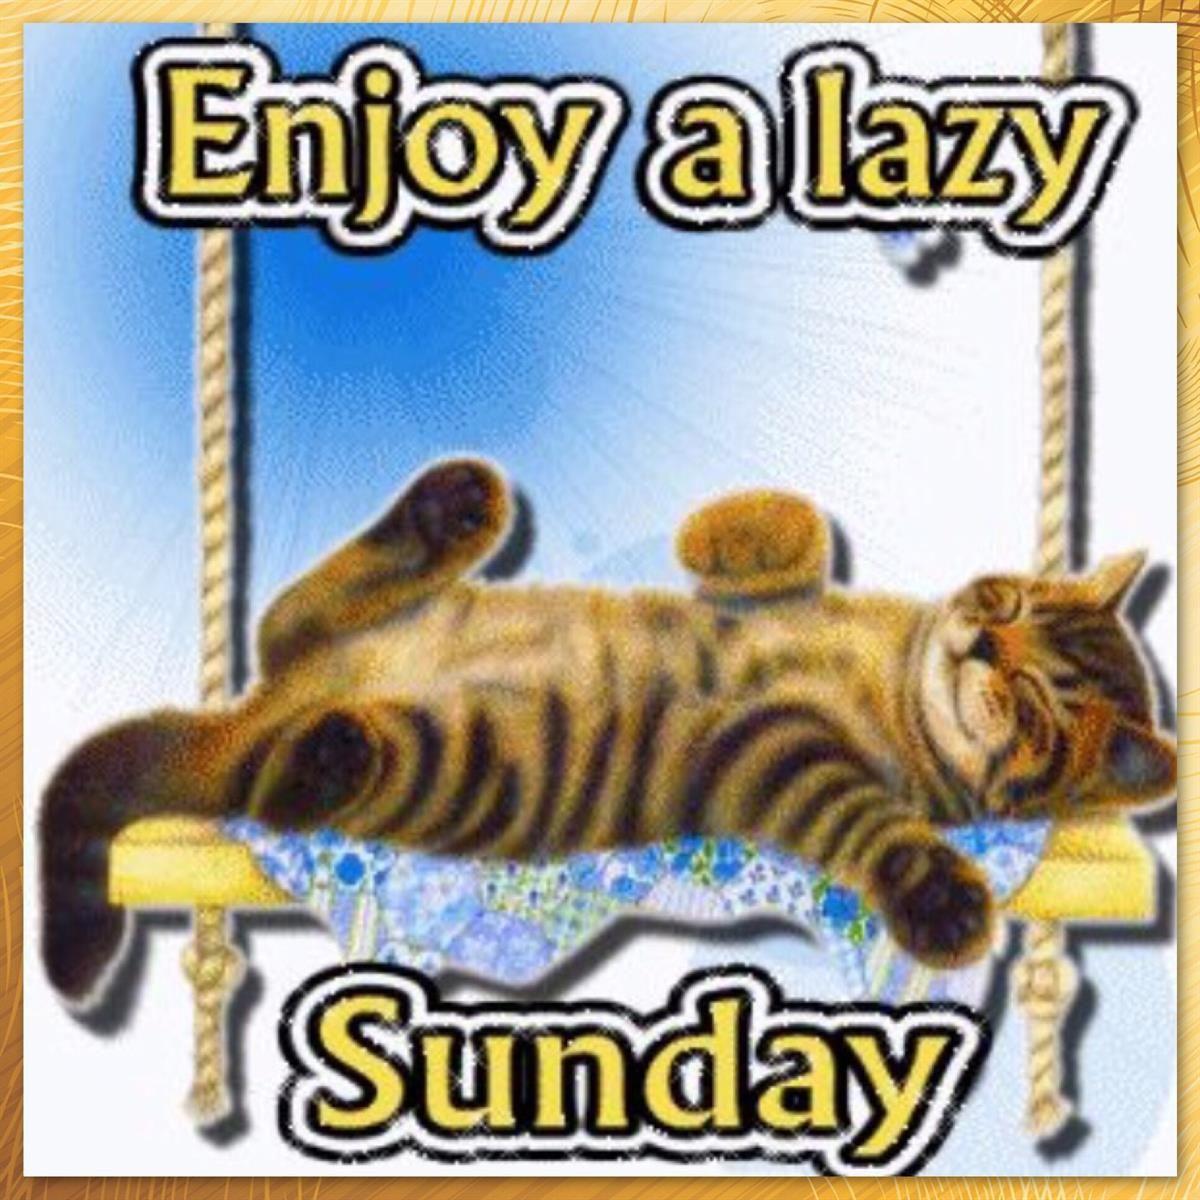 #Relax #Enjoy